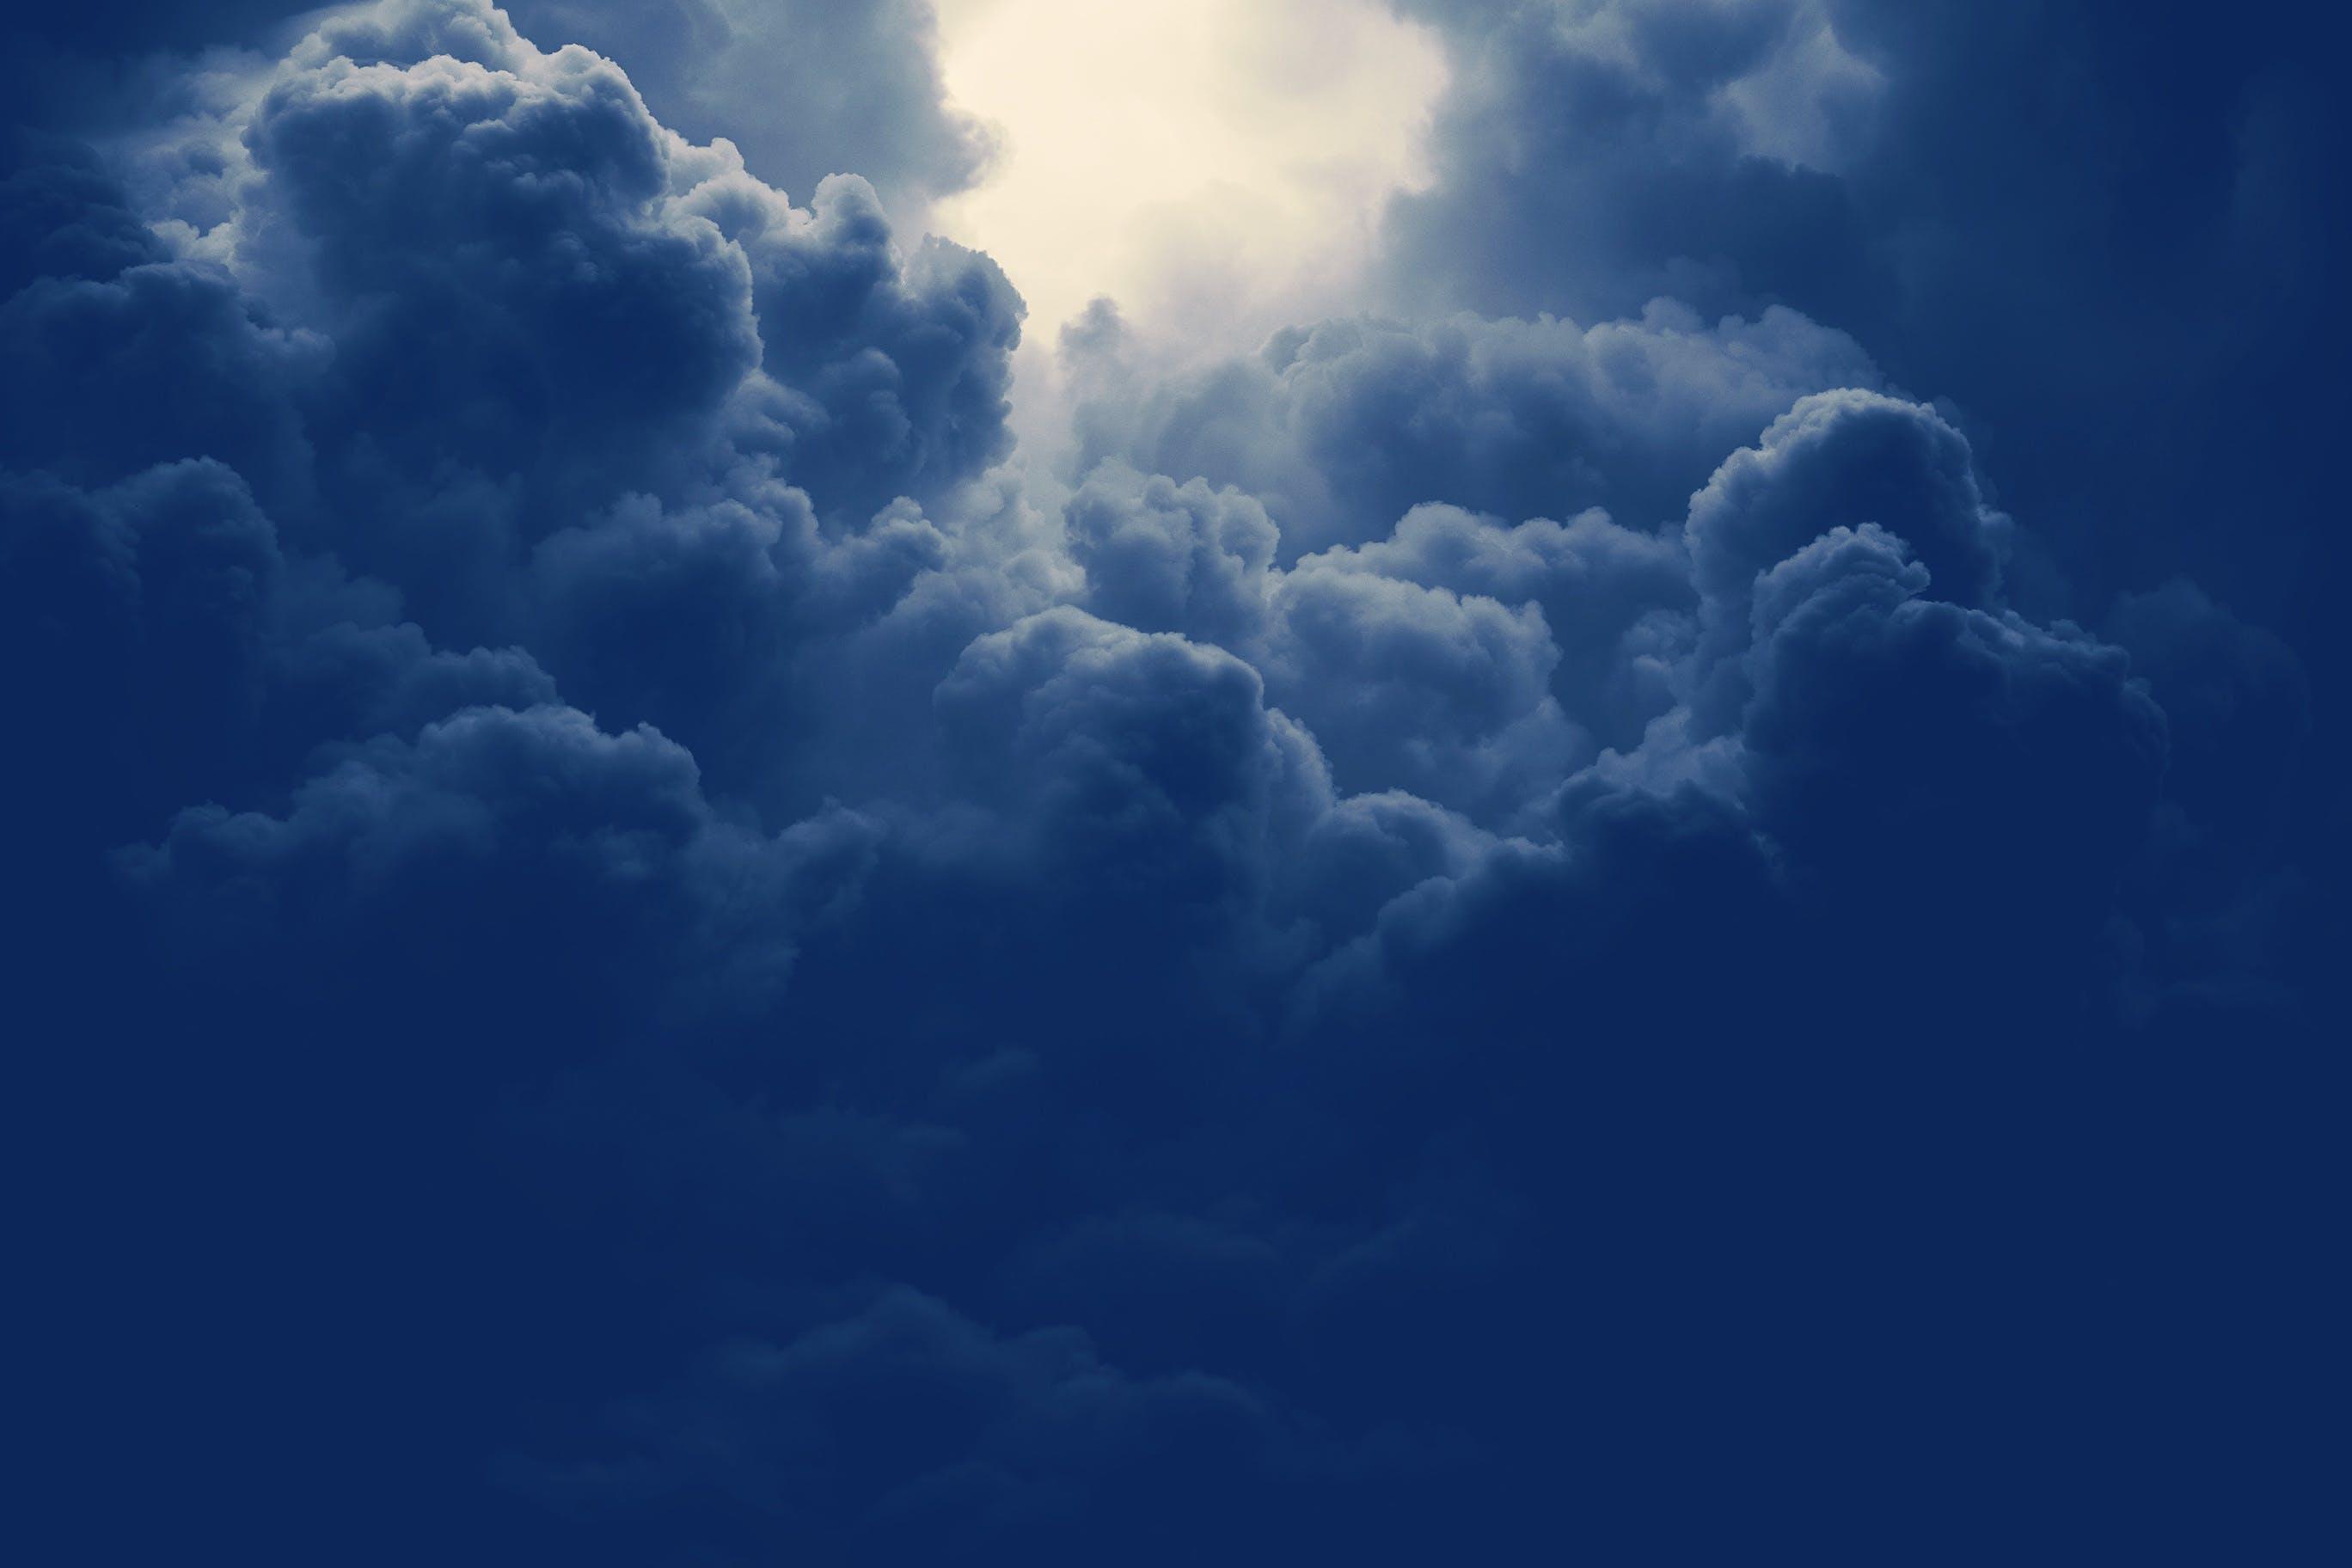 zu atmosphäre, bewölkt, blau, geschwollen